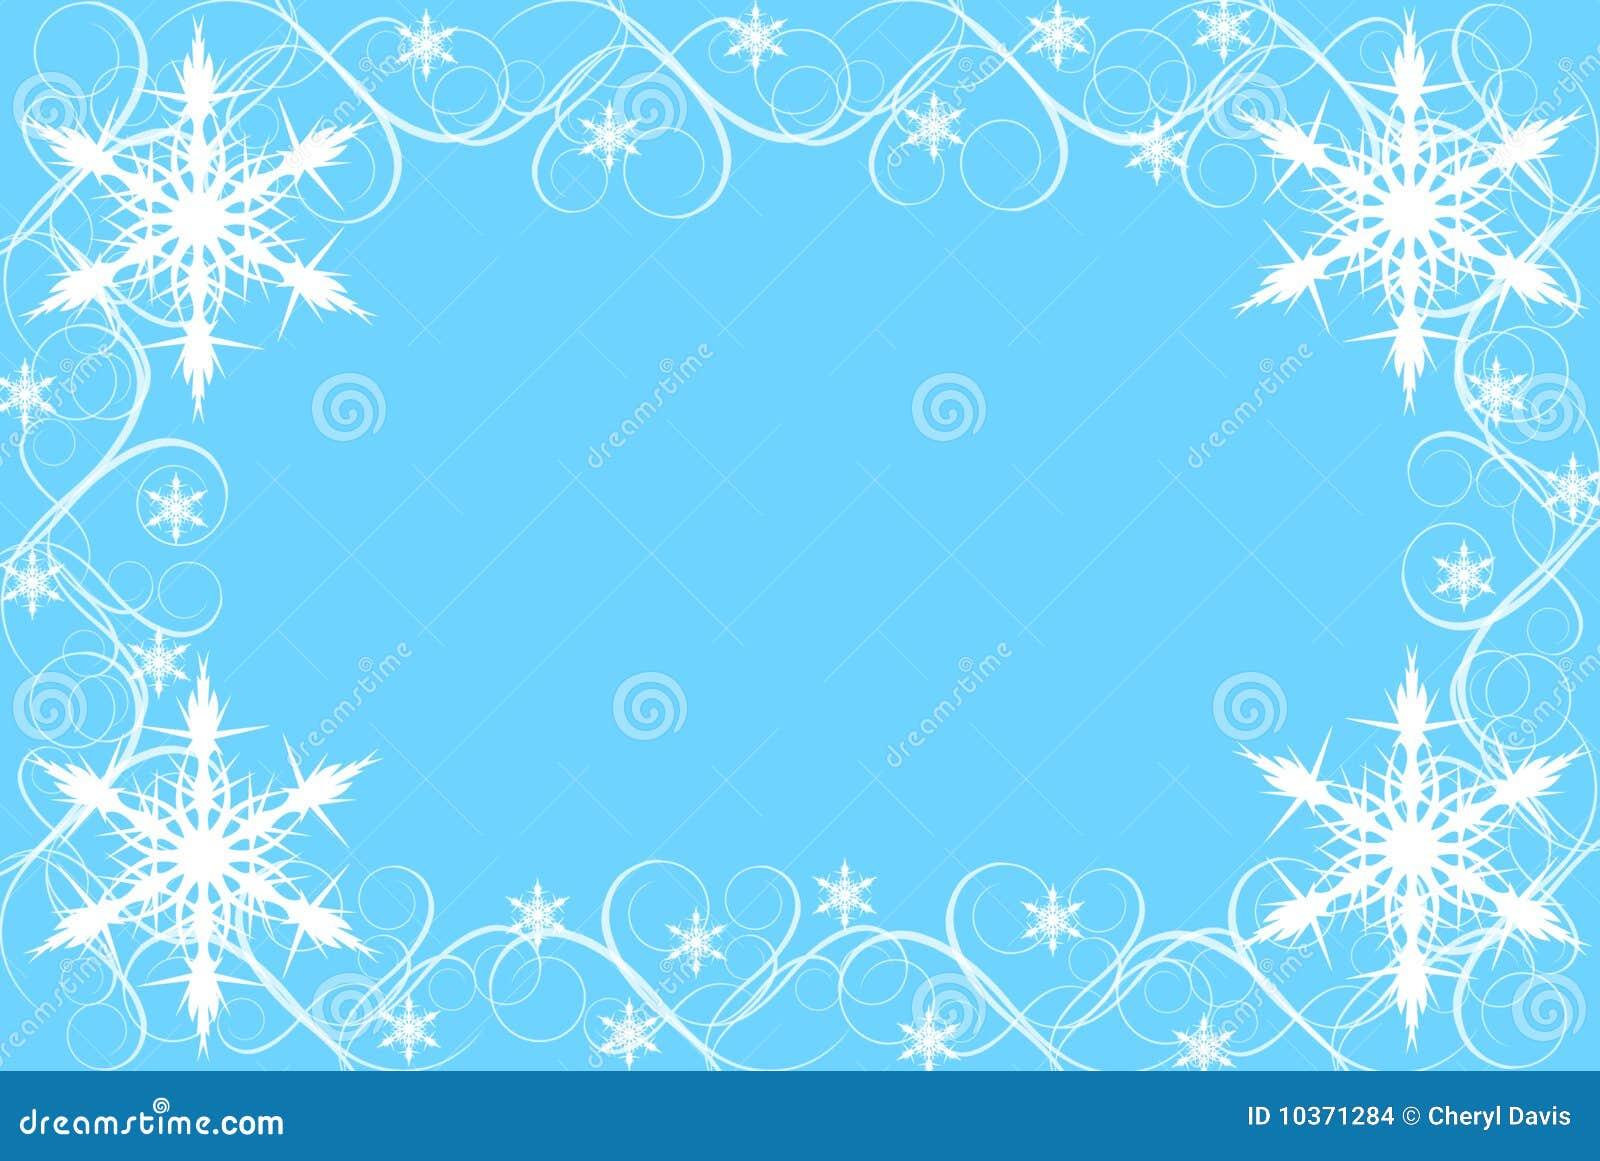 snowflake and swirl border on blue background stock illustration